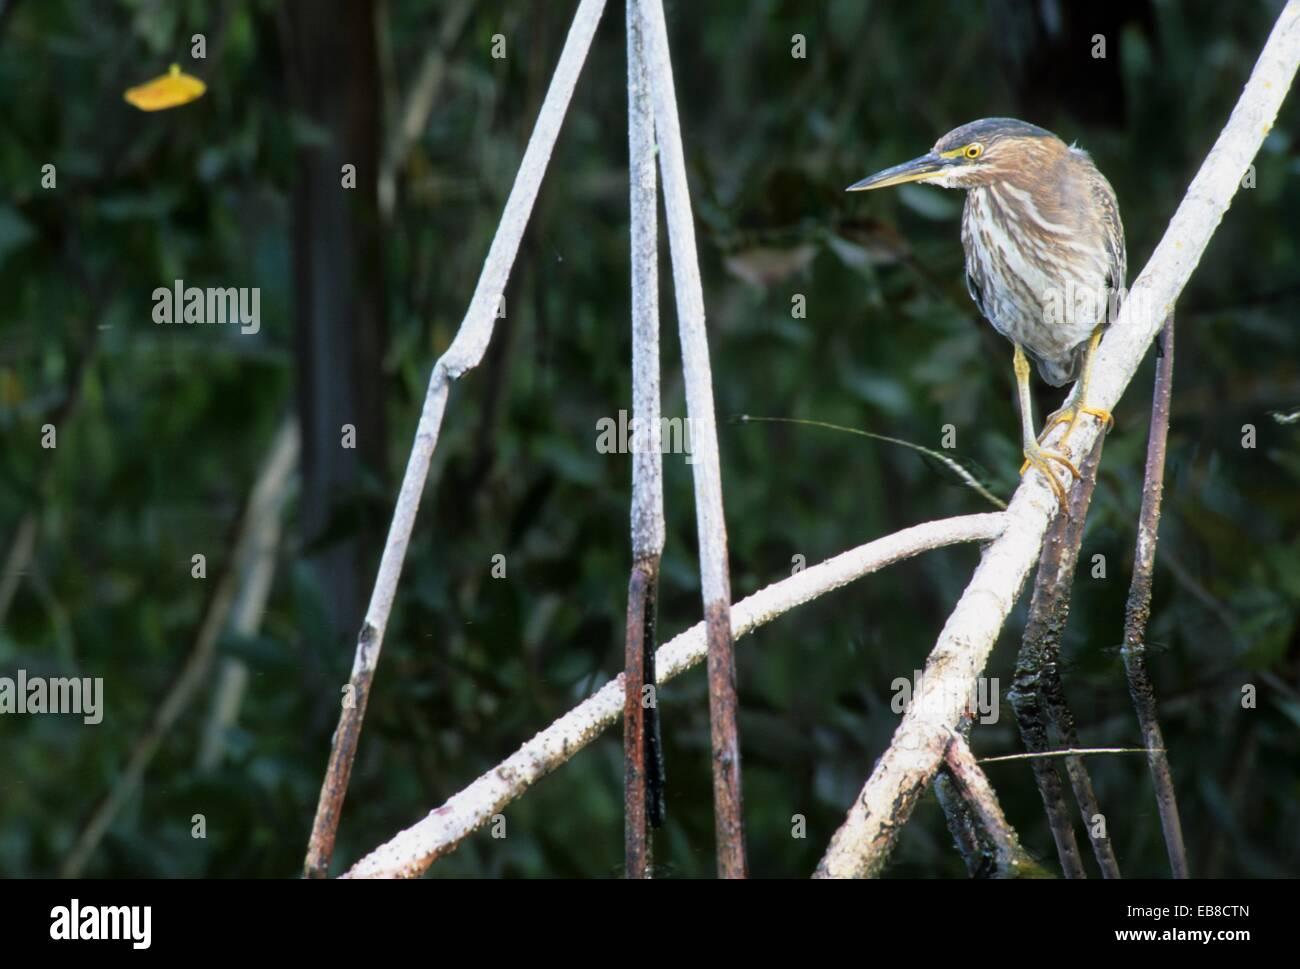 Green-backed heron, JN Ding Darling National Wildlife Refuge, Florida. - Stock Image